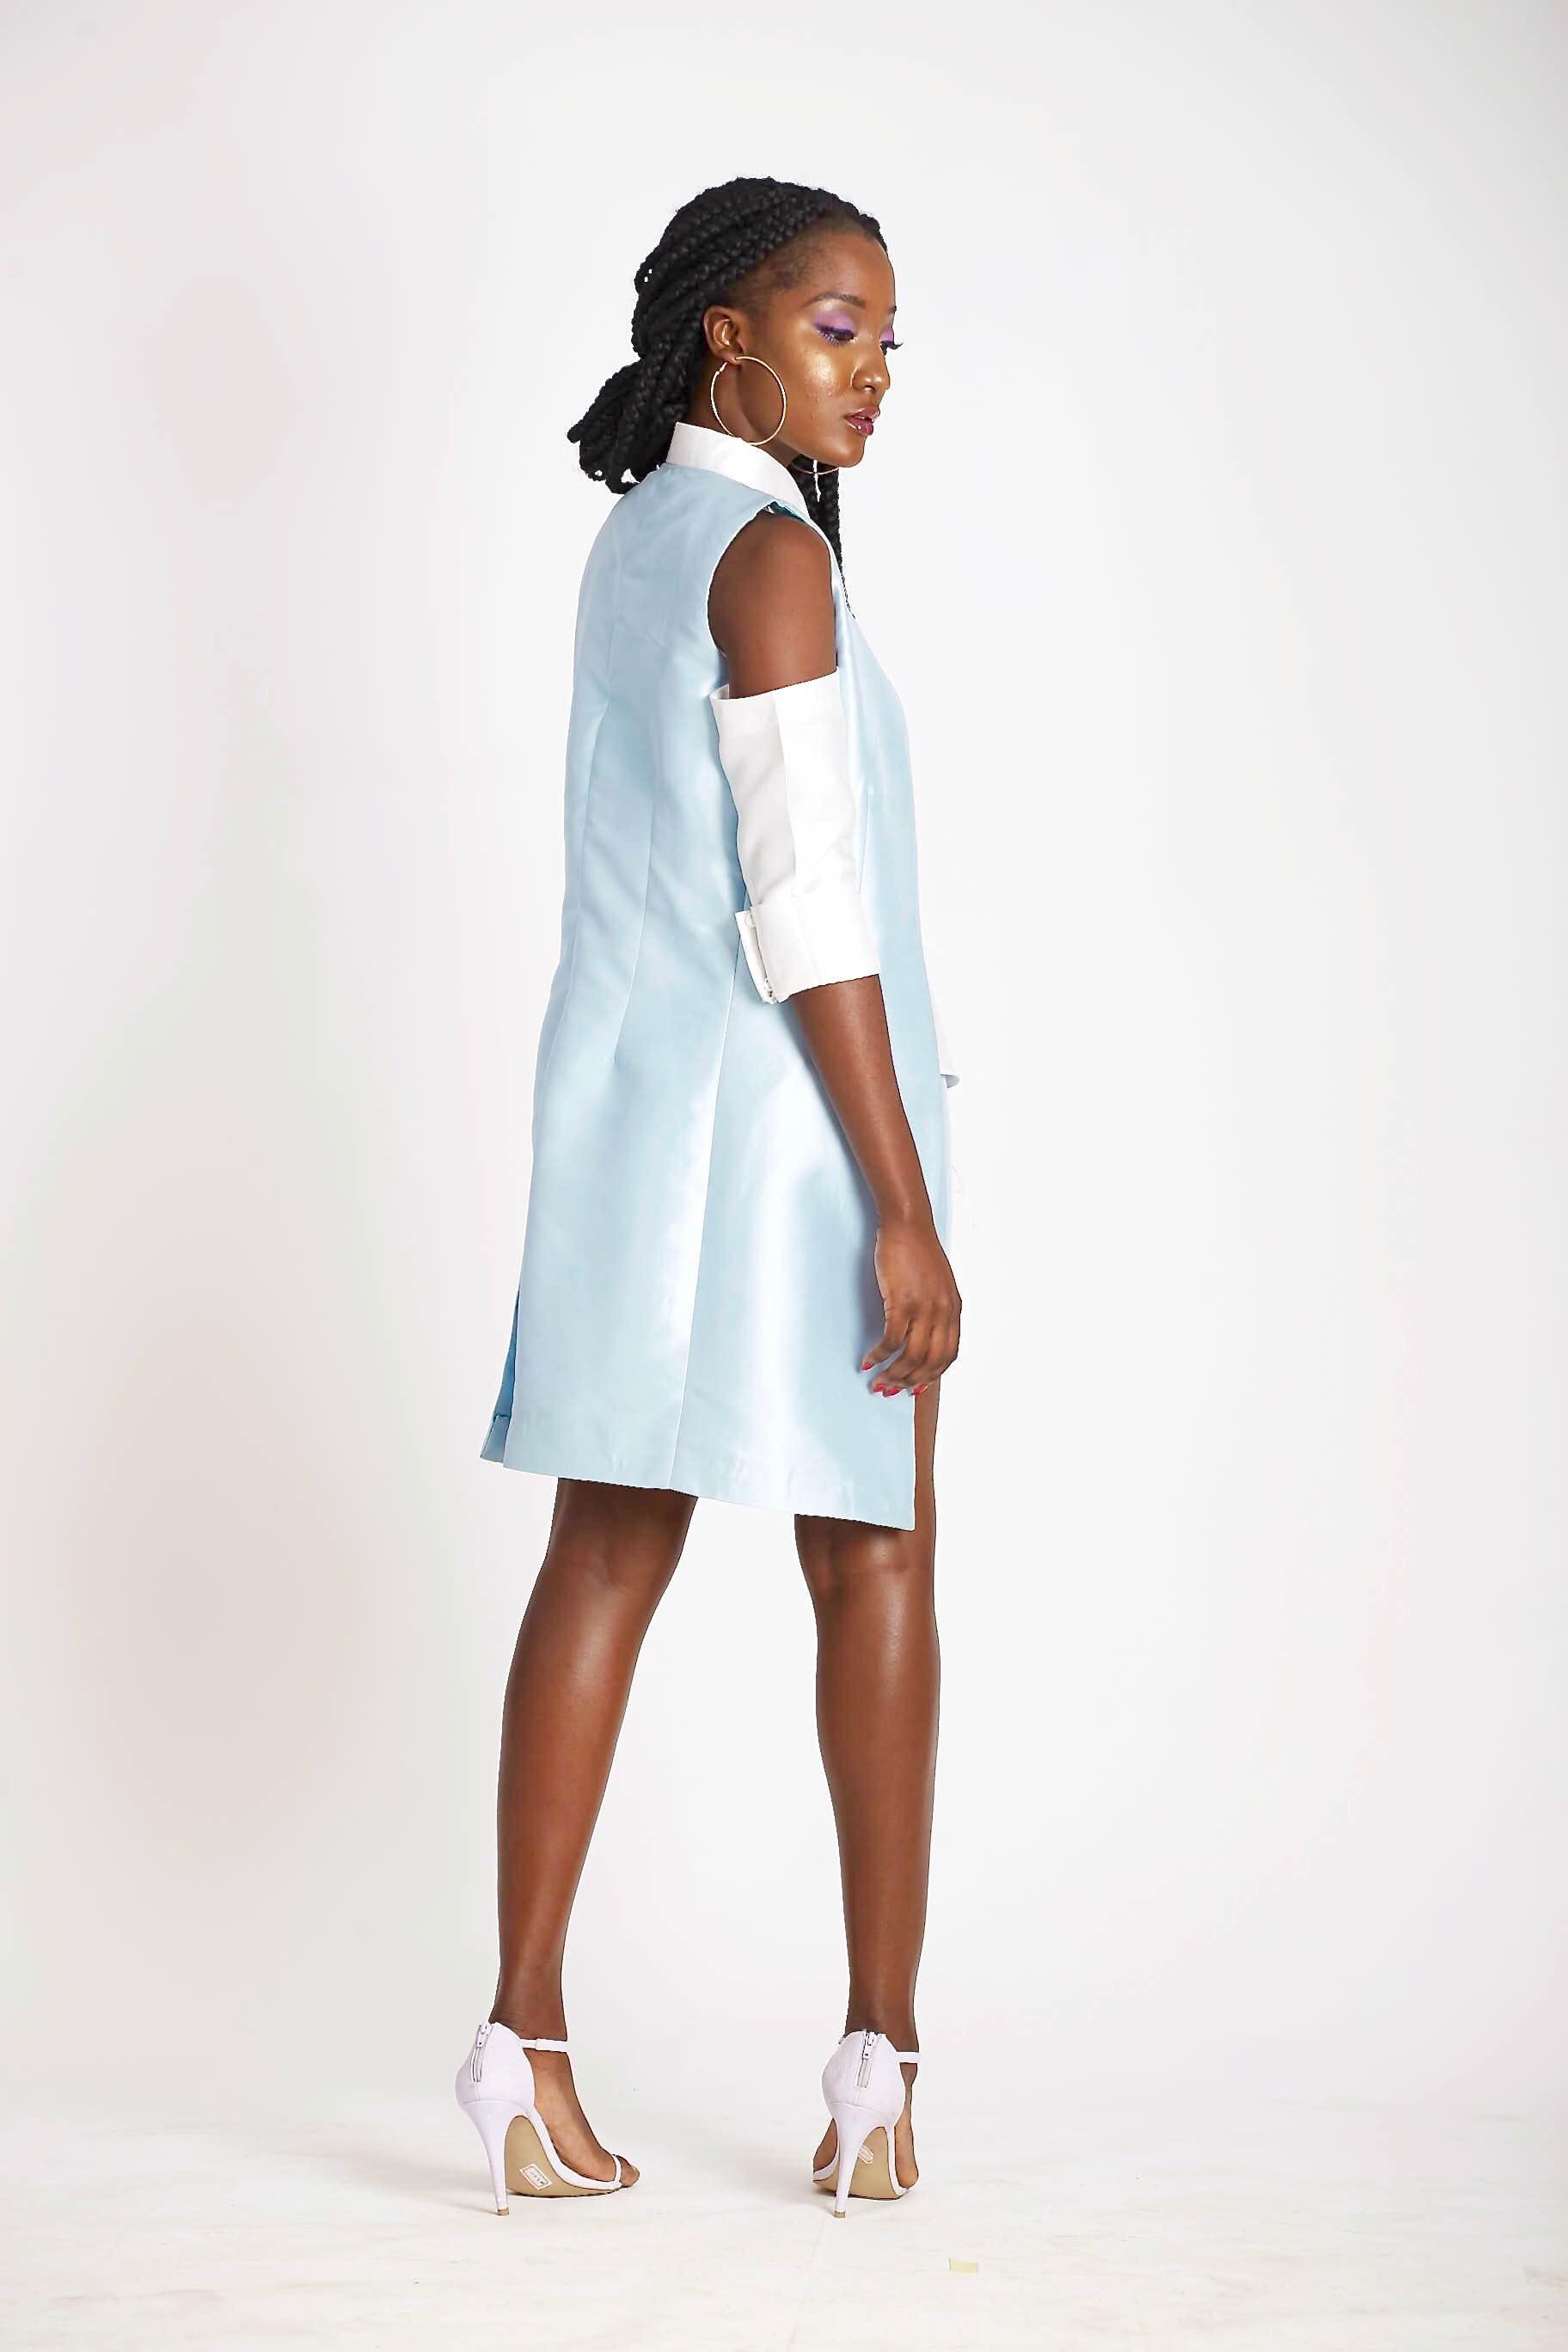 Imad Eduso - BN Style - Collection Lookbook - BellaNaija.com 011